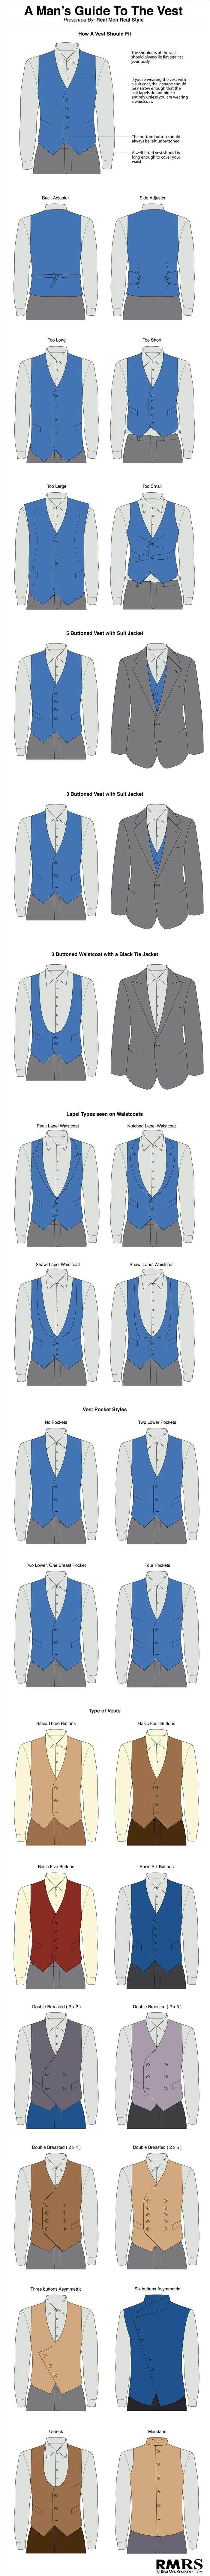 Capsule Wardrobe For Men eBook